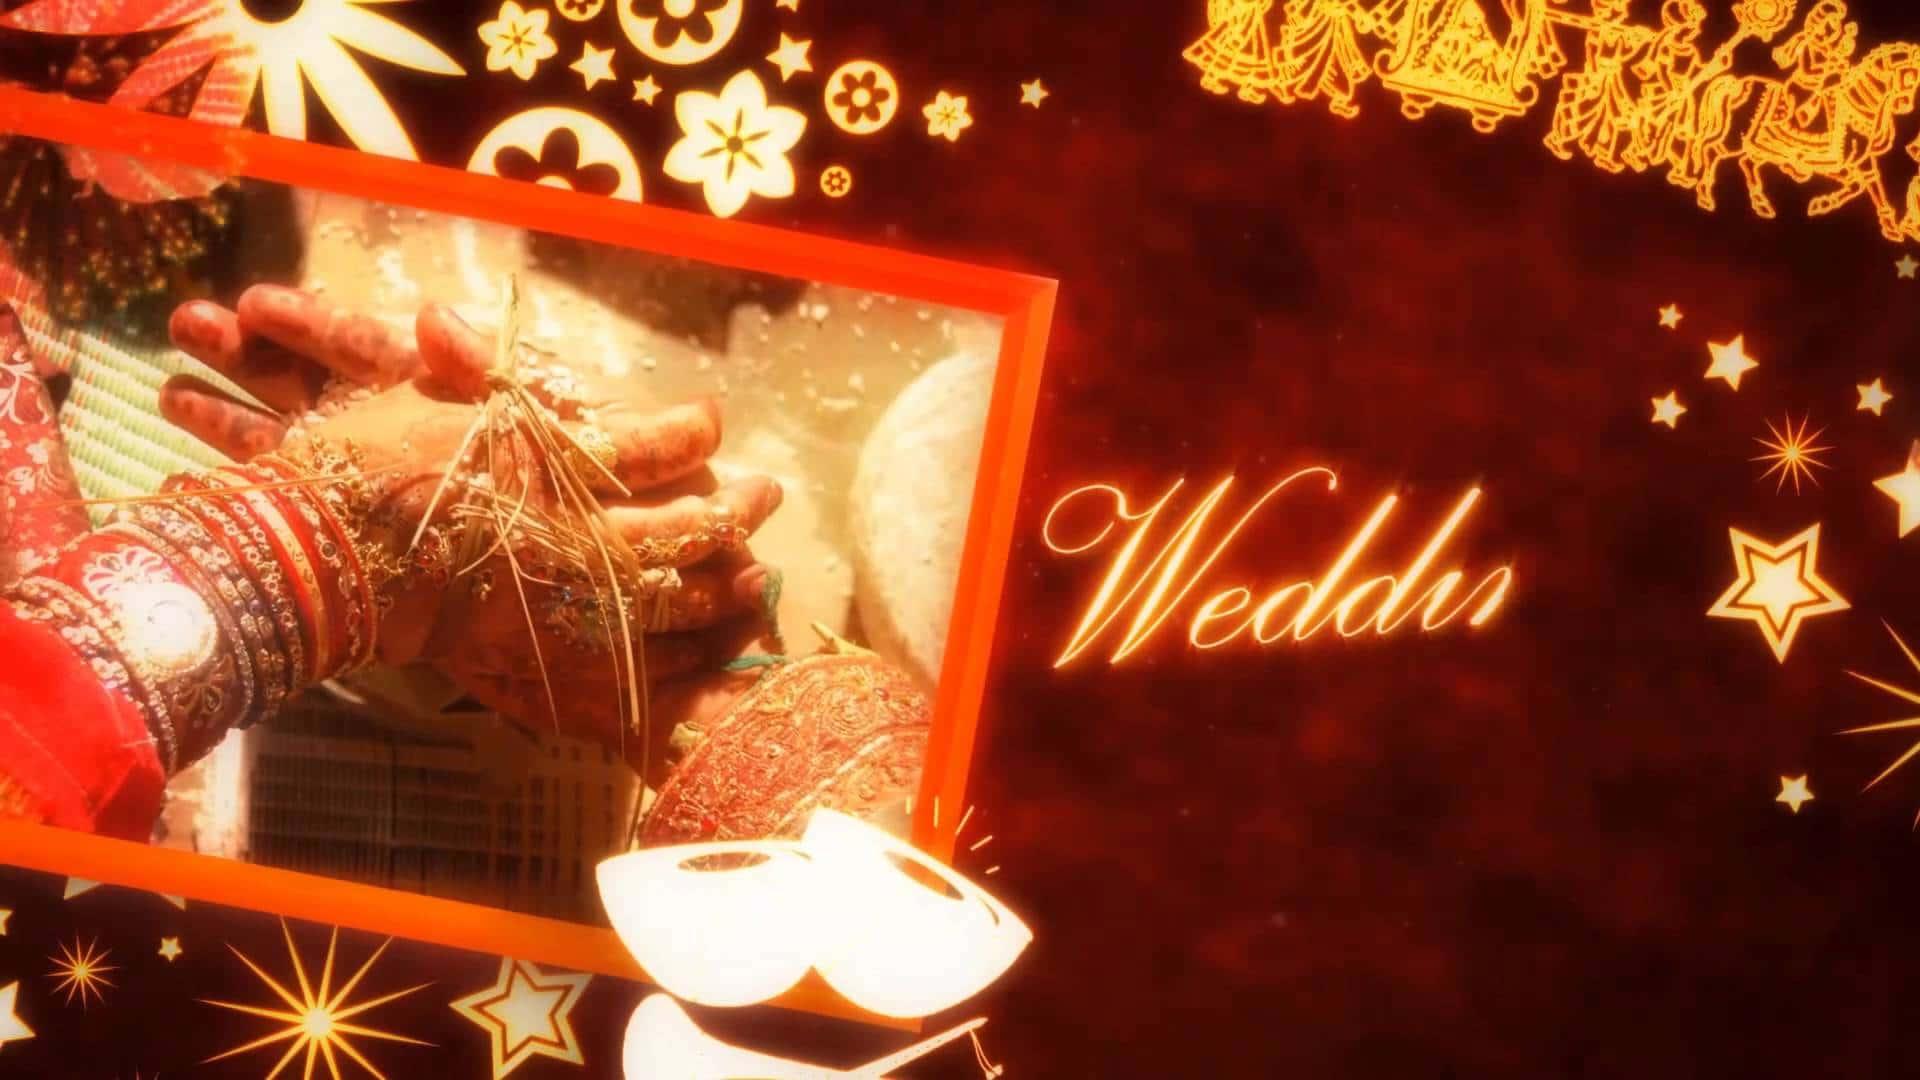 Awesome Traditional Wedding Invitation For Hindu Wedding Video